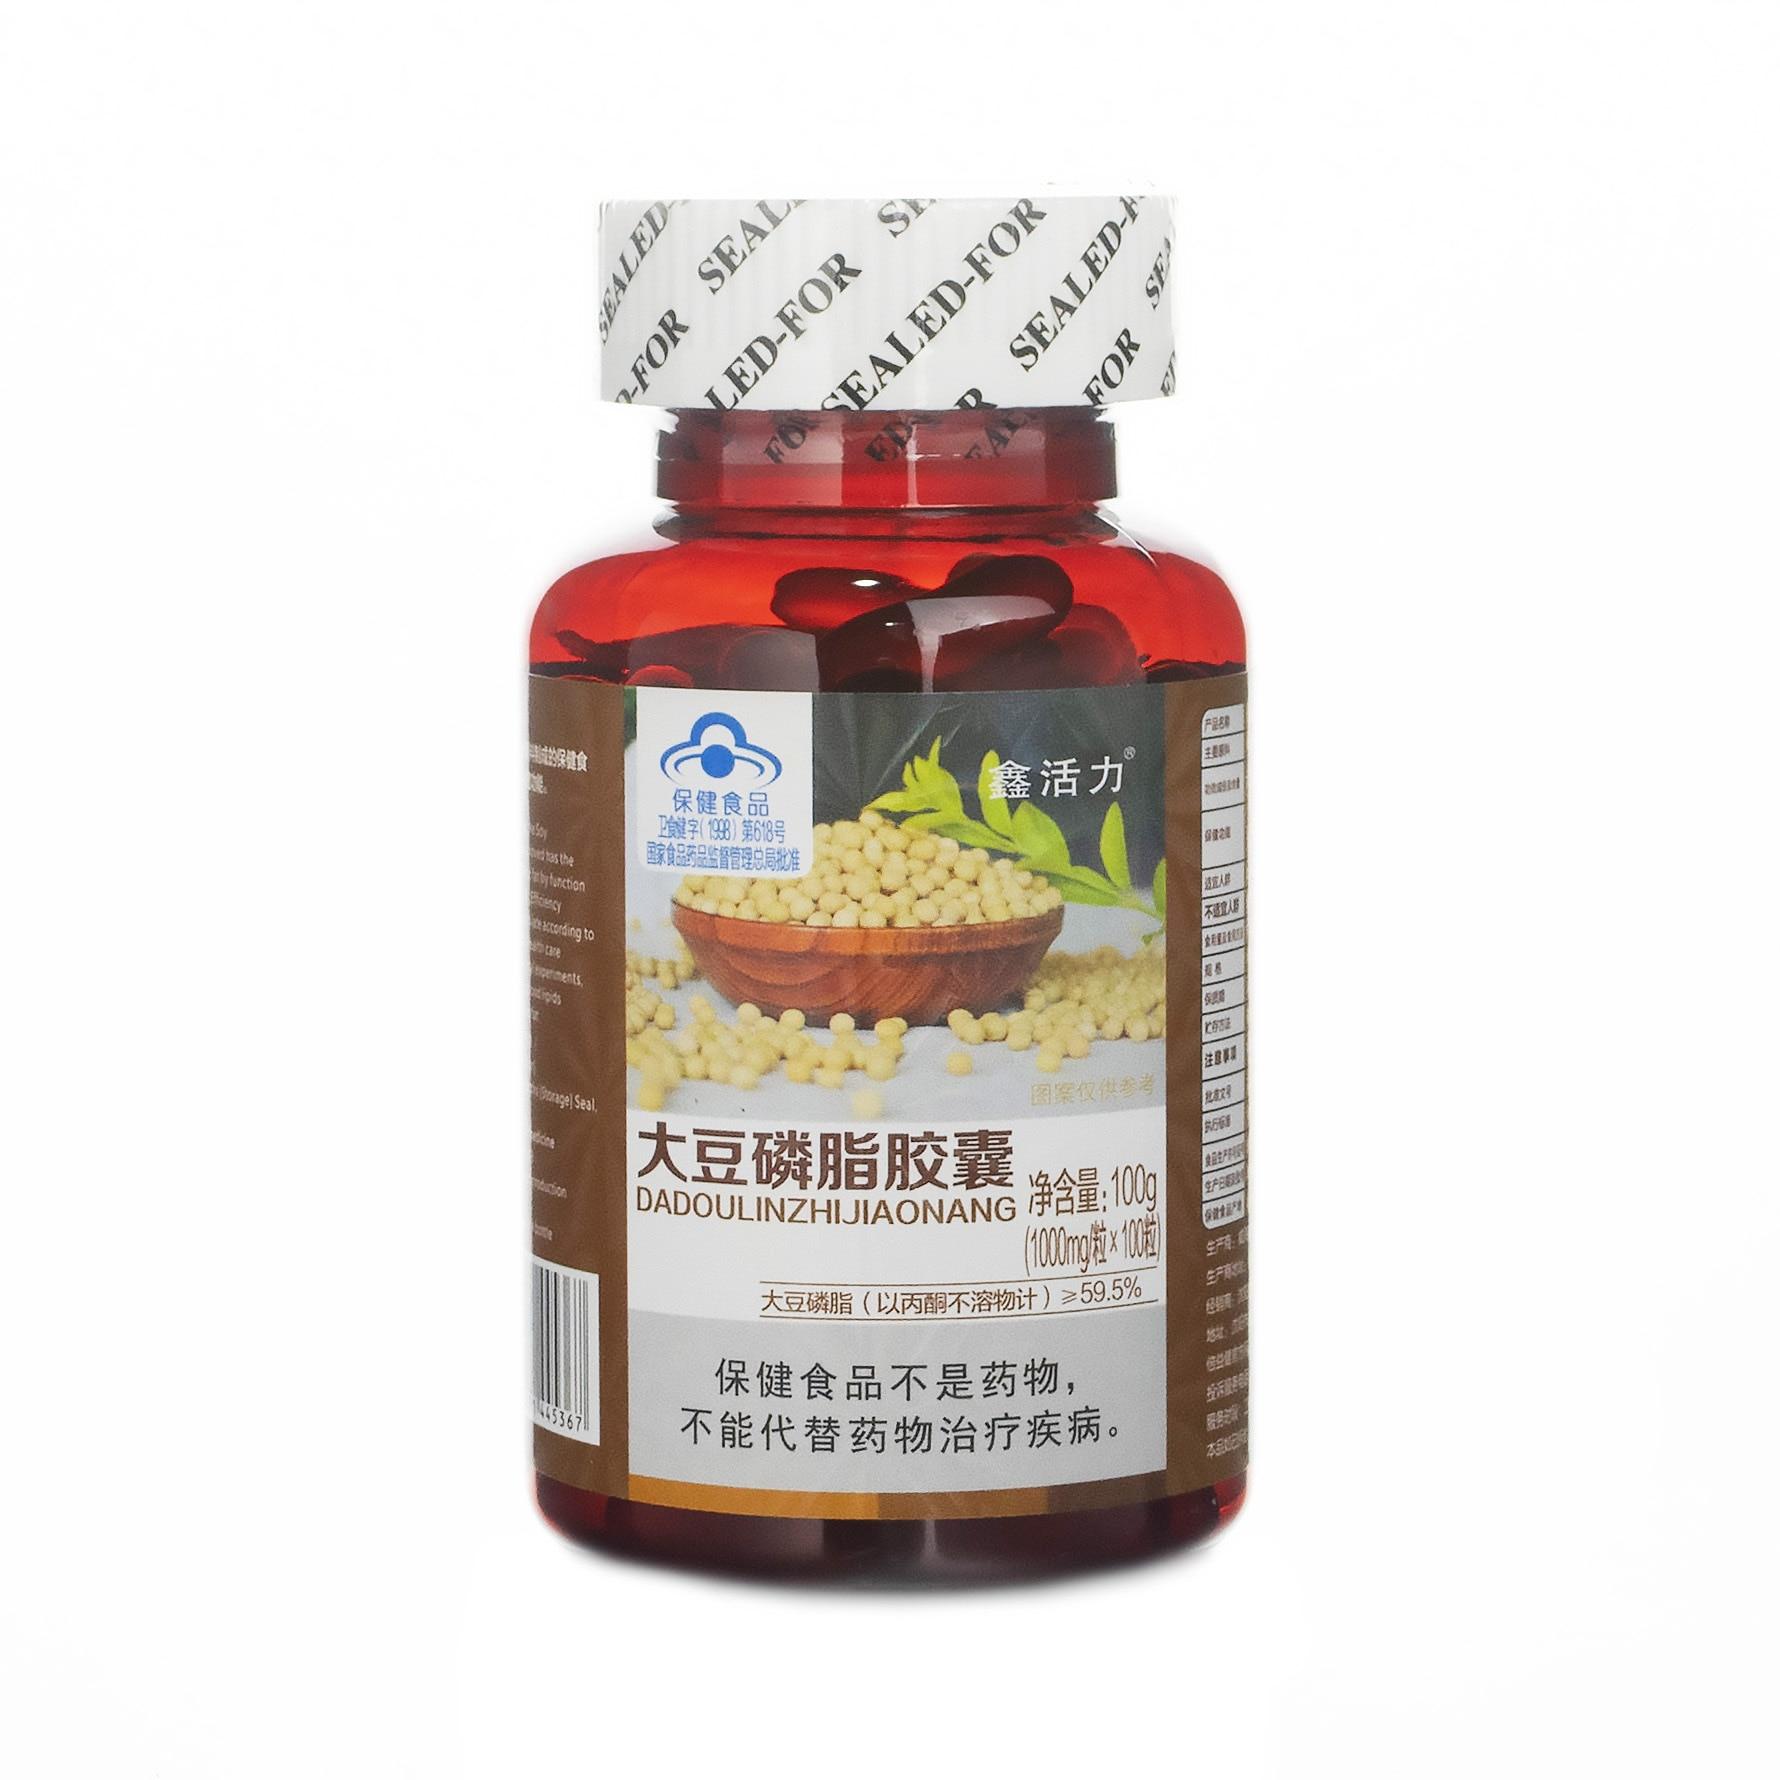 [xin Qi] Soybean Lecithin Capsule 100 Tablets Regular Blue Hat Health Food Pharmacy 2017 Nian 10 Yue Soy Lecithin 24 Cfda